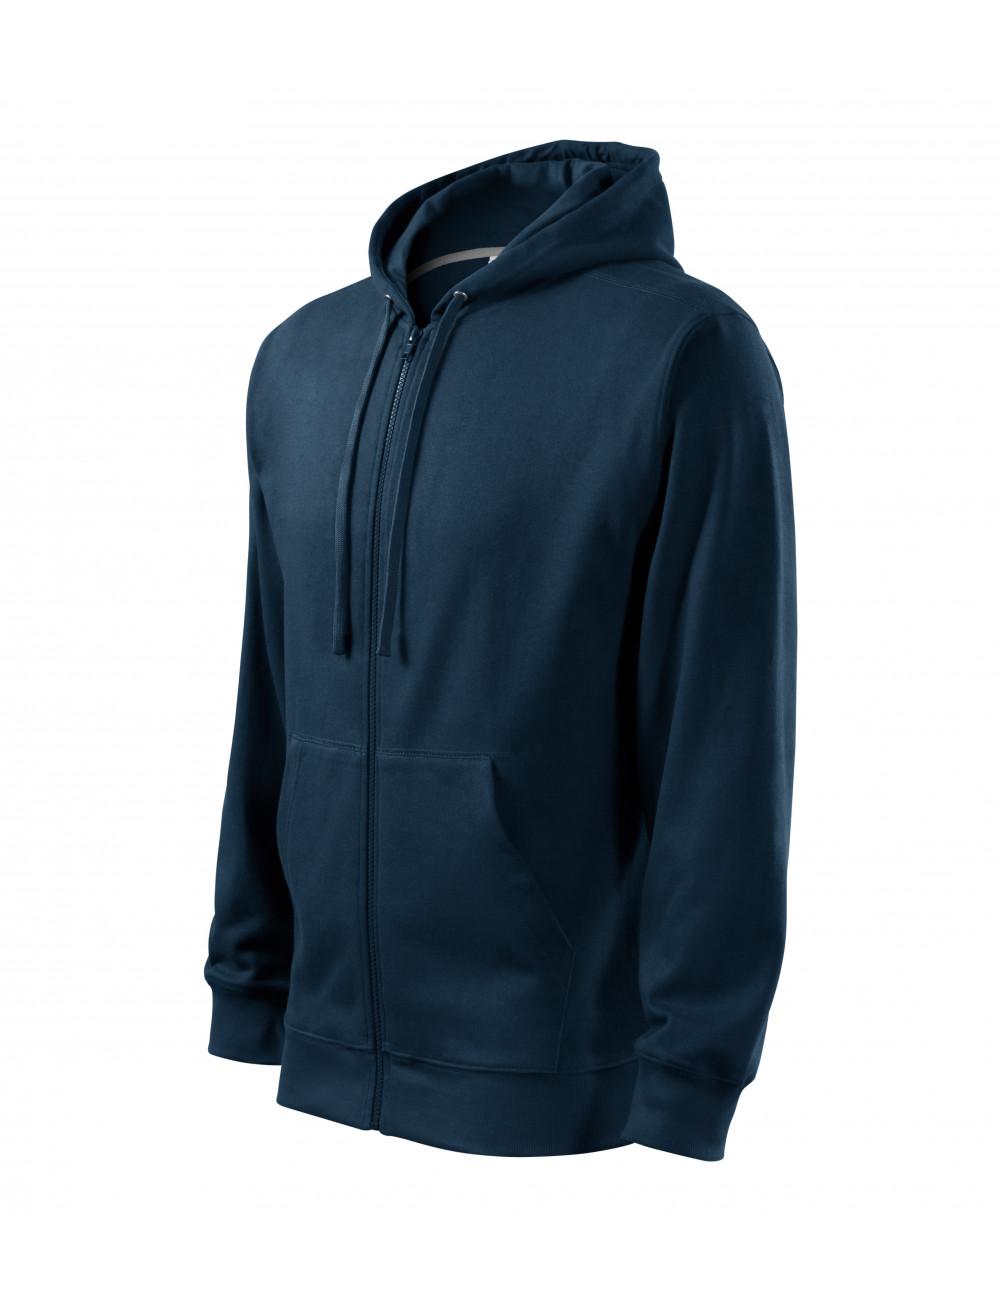 Adler MALFINI Bluza męska Trendy Zipper 410 granatowy